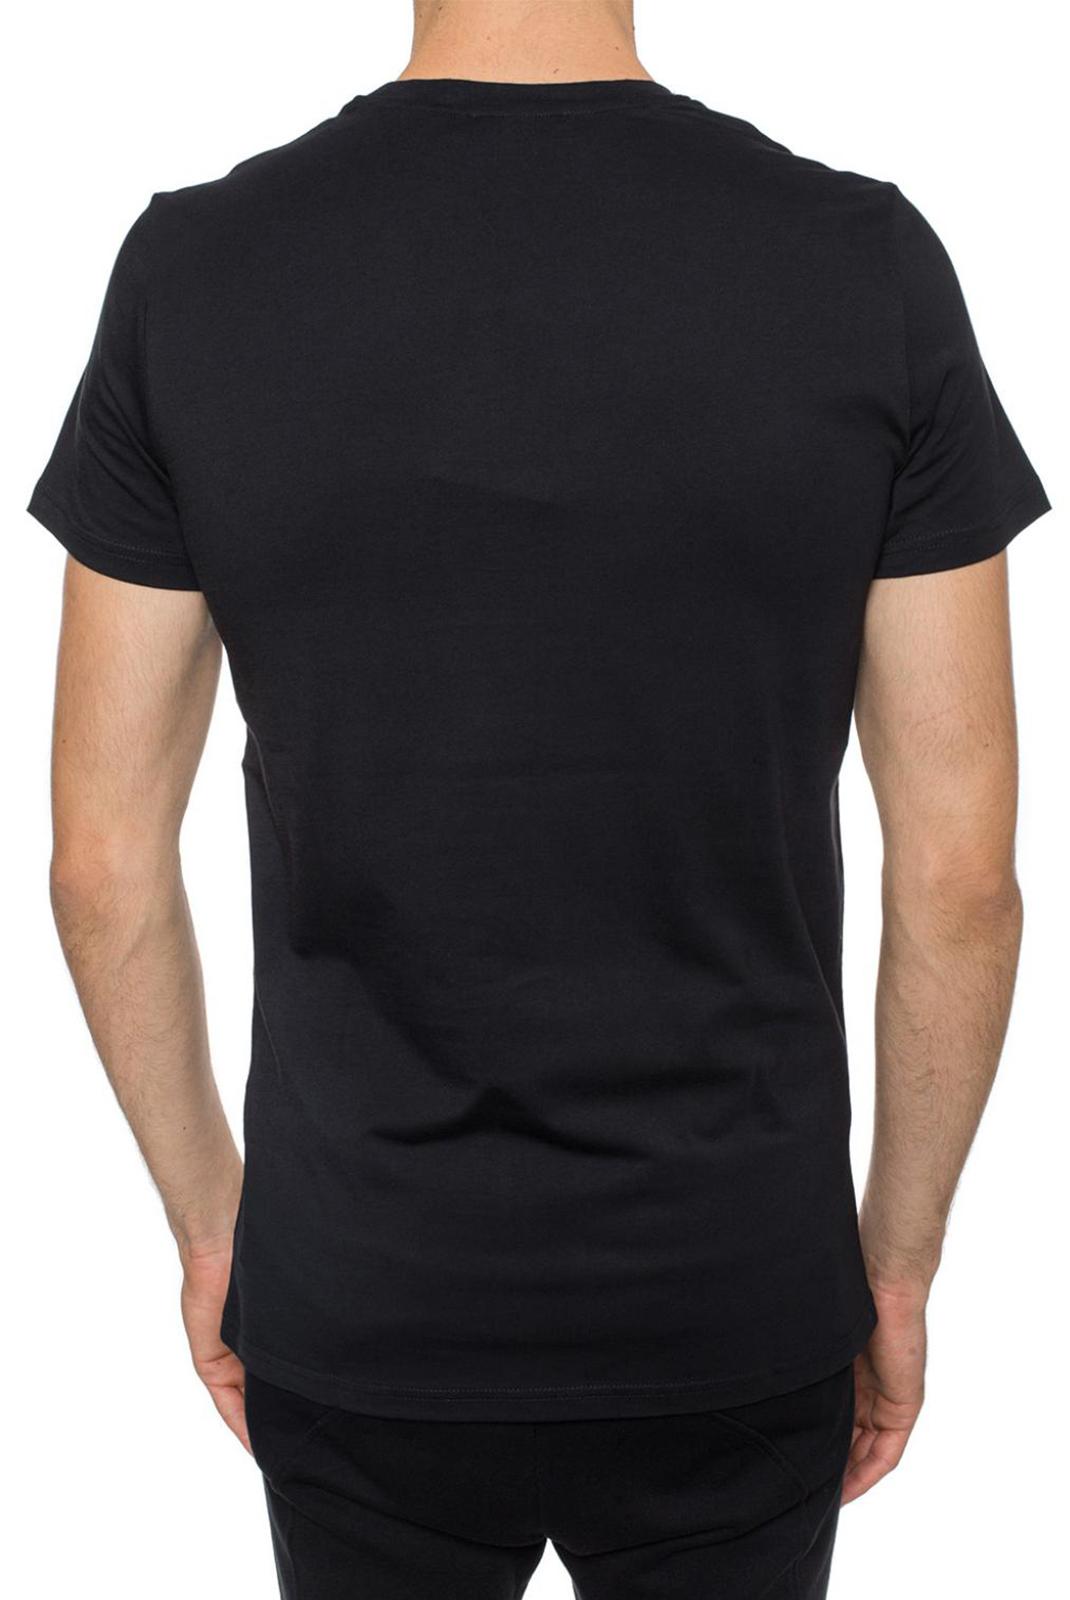 Tee-shirts  Balmain W8H8601 BLACK/BLACK